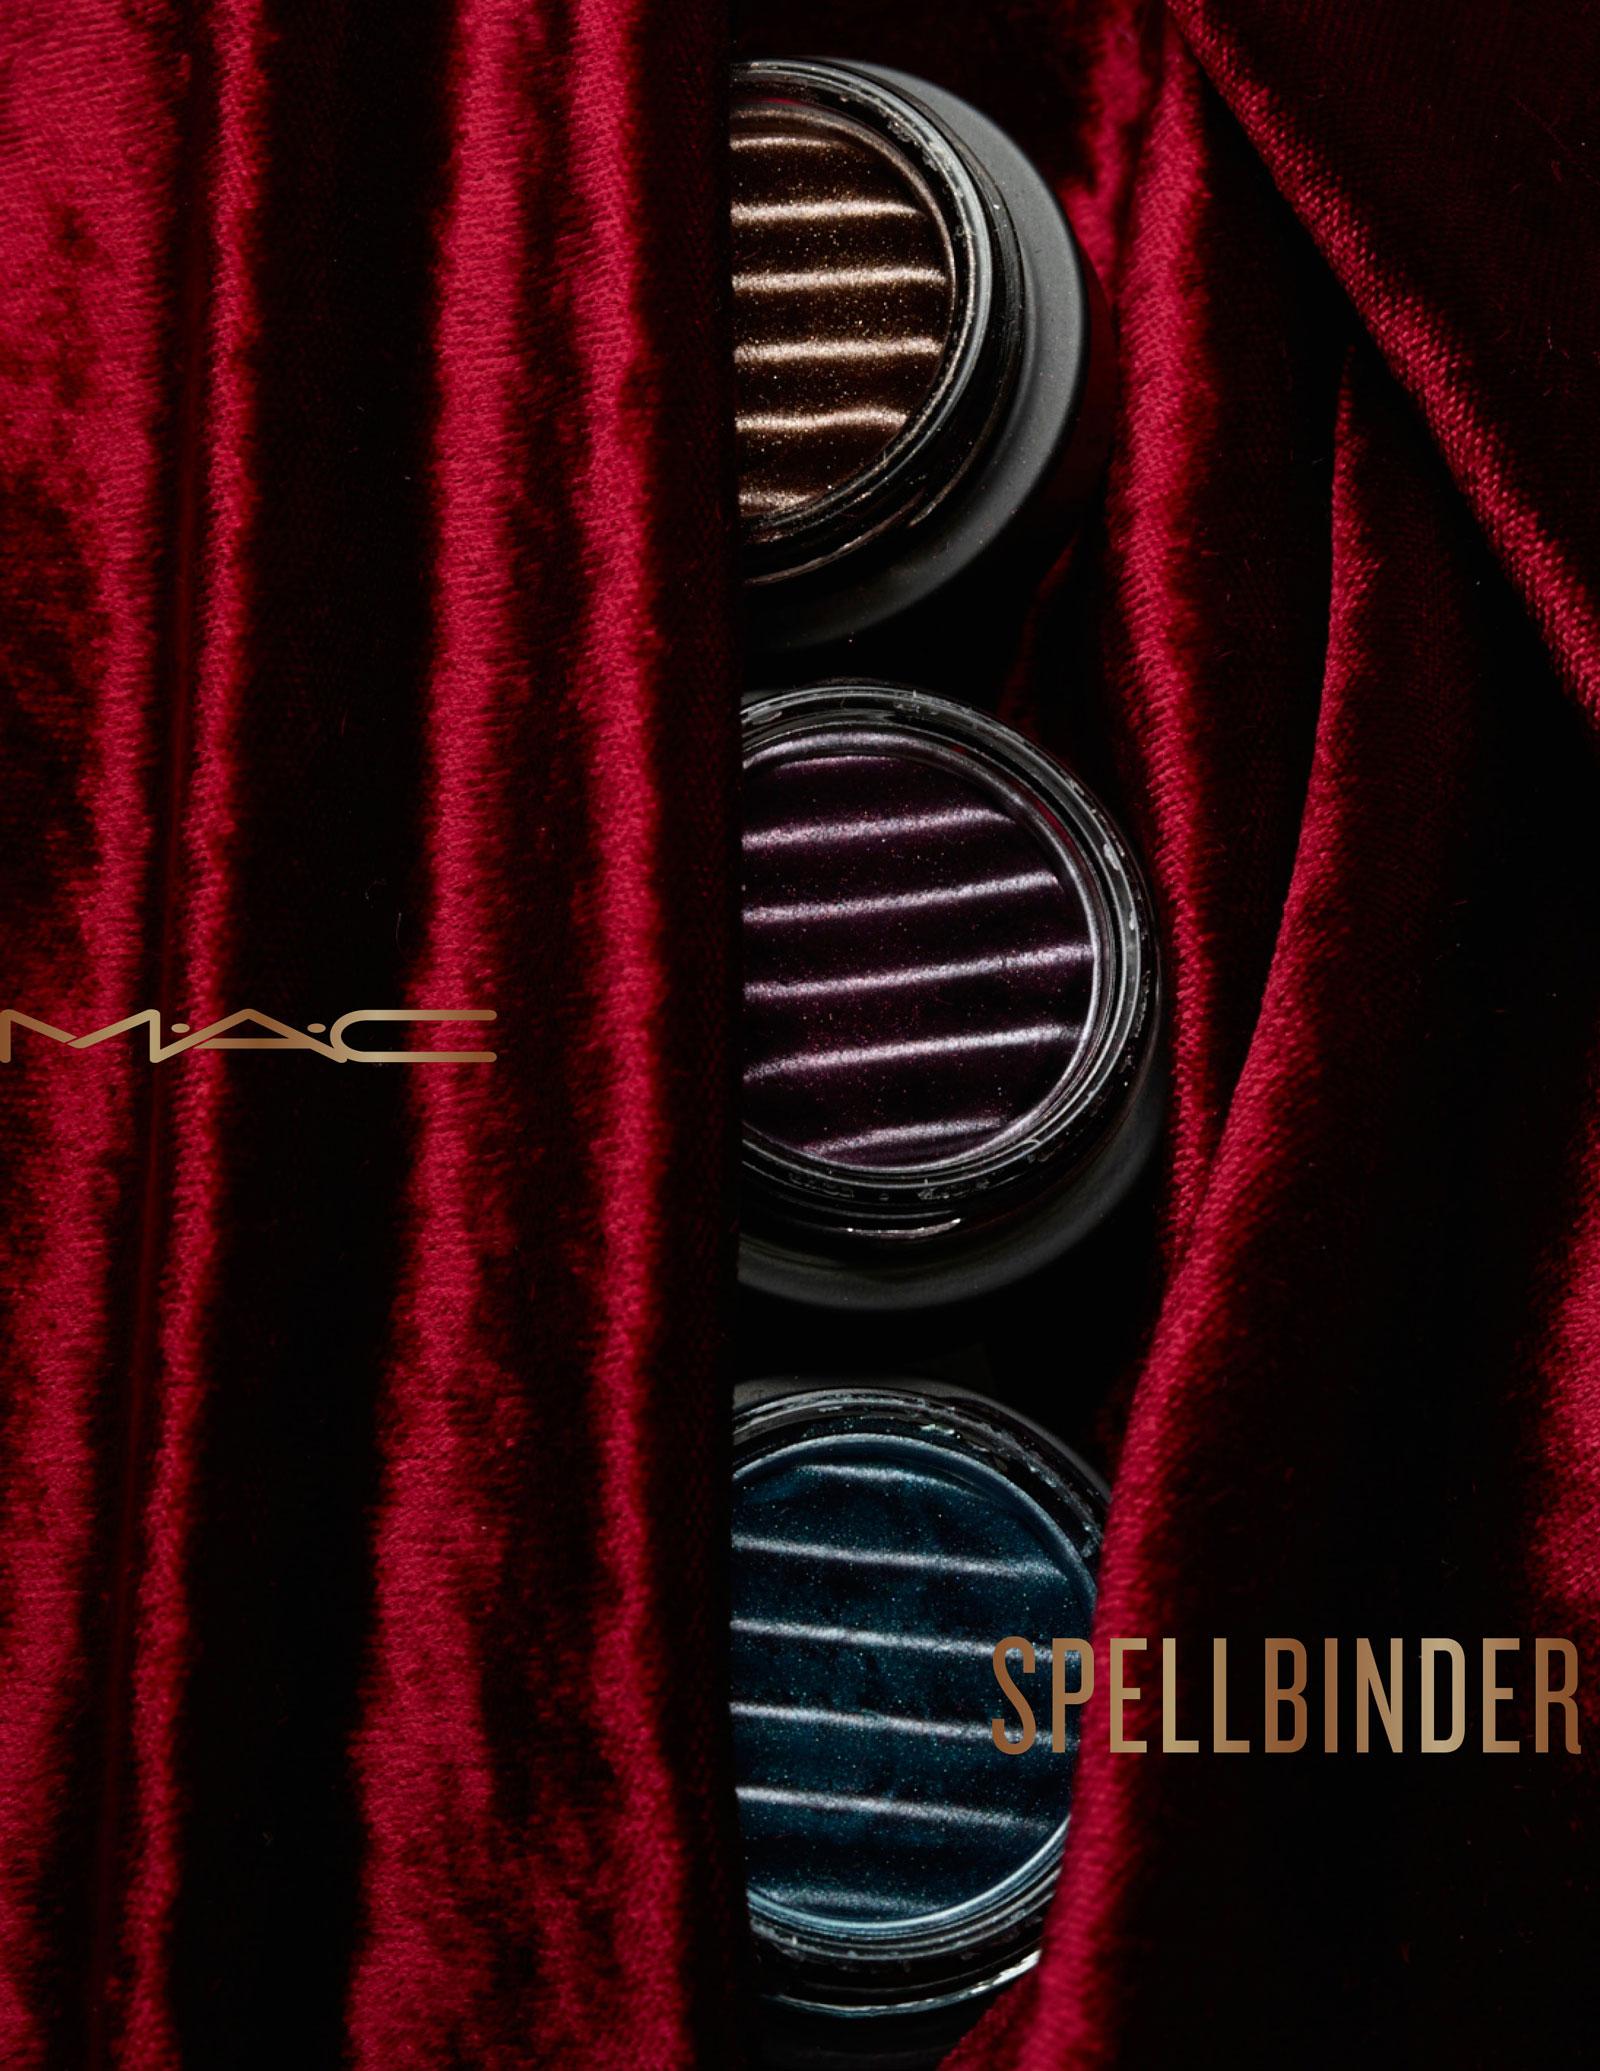 MAC Spellbinder Eyeshadows for Fall 2016